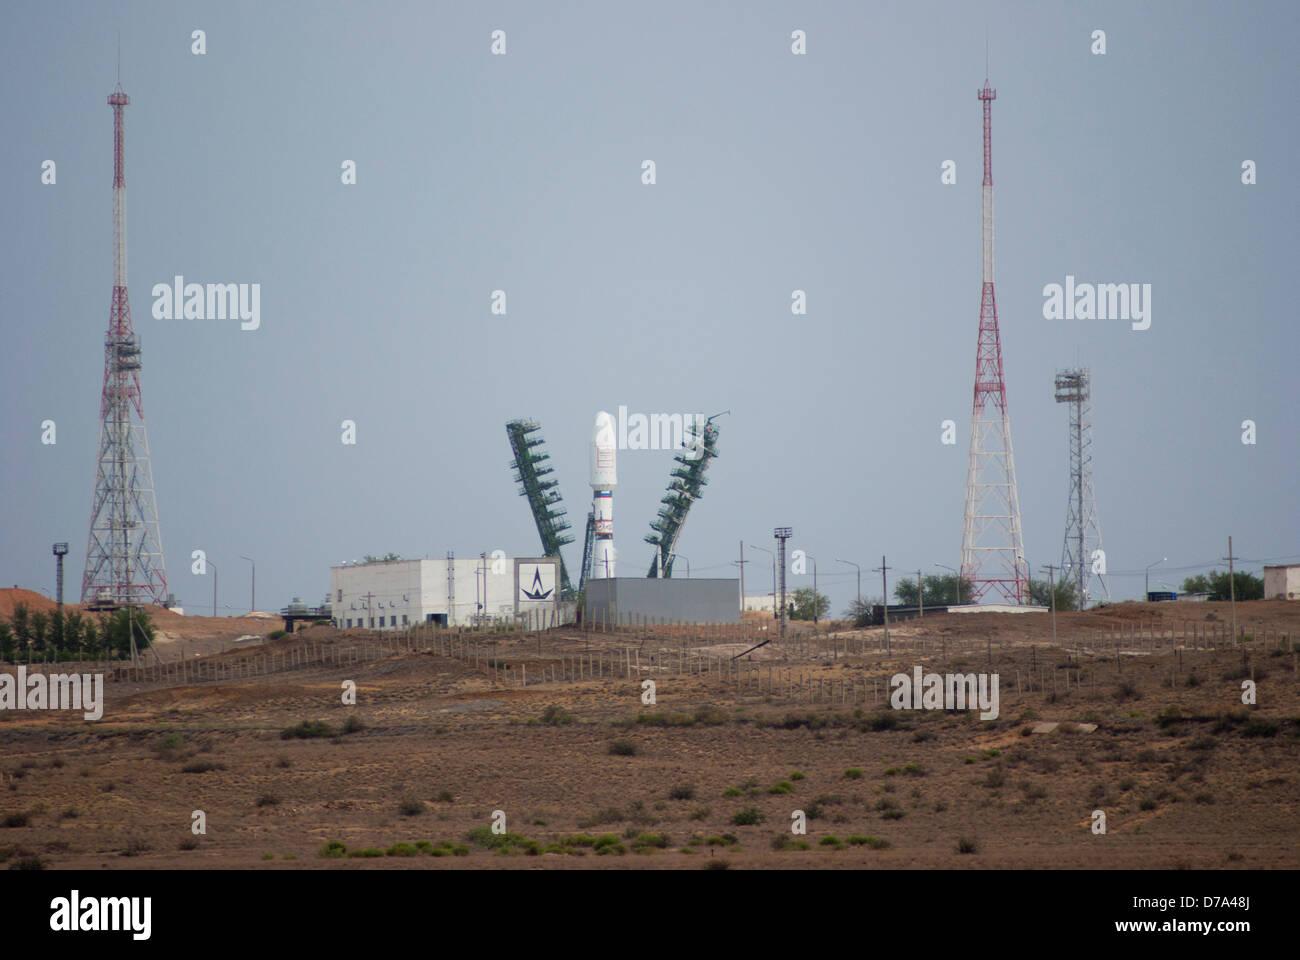 Soyuz rocket on launch pad Baikonur Cosmodrome Kazakhstan - Stock Image